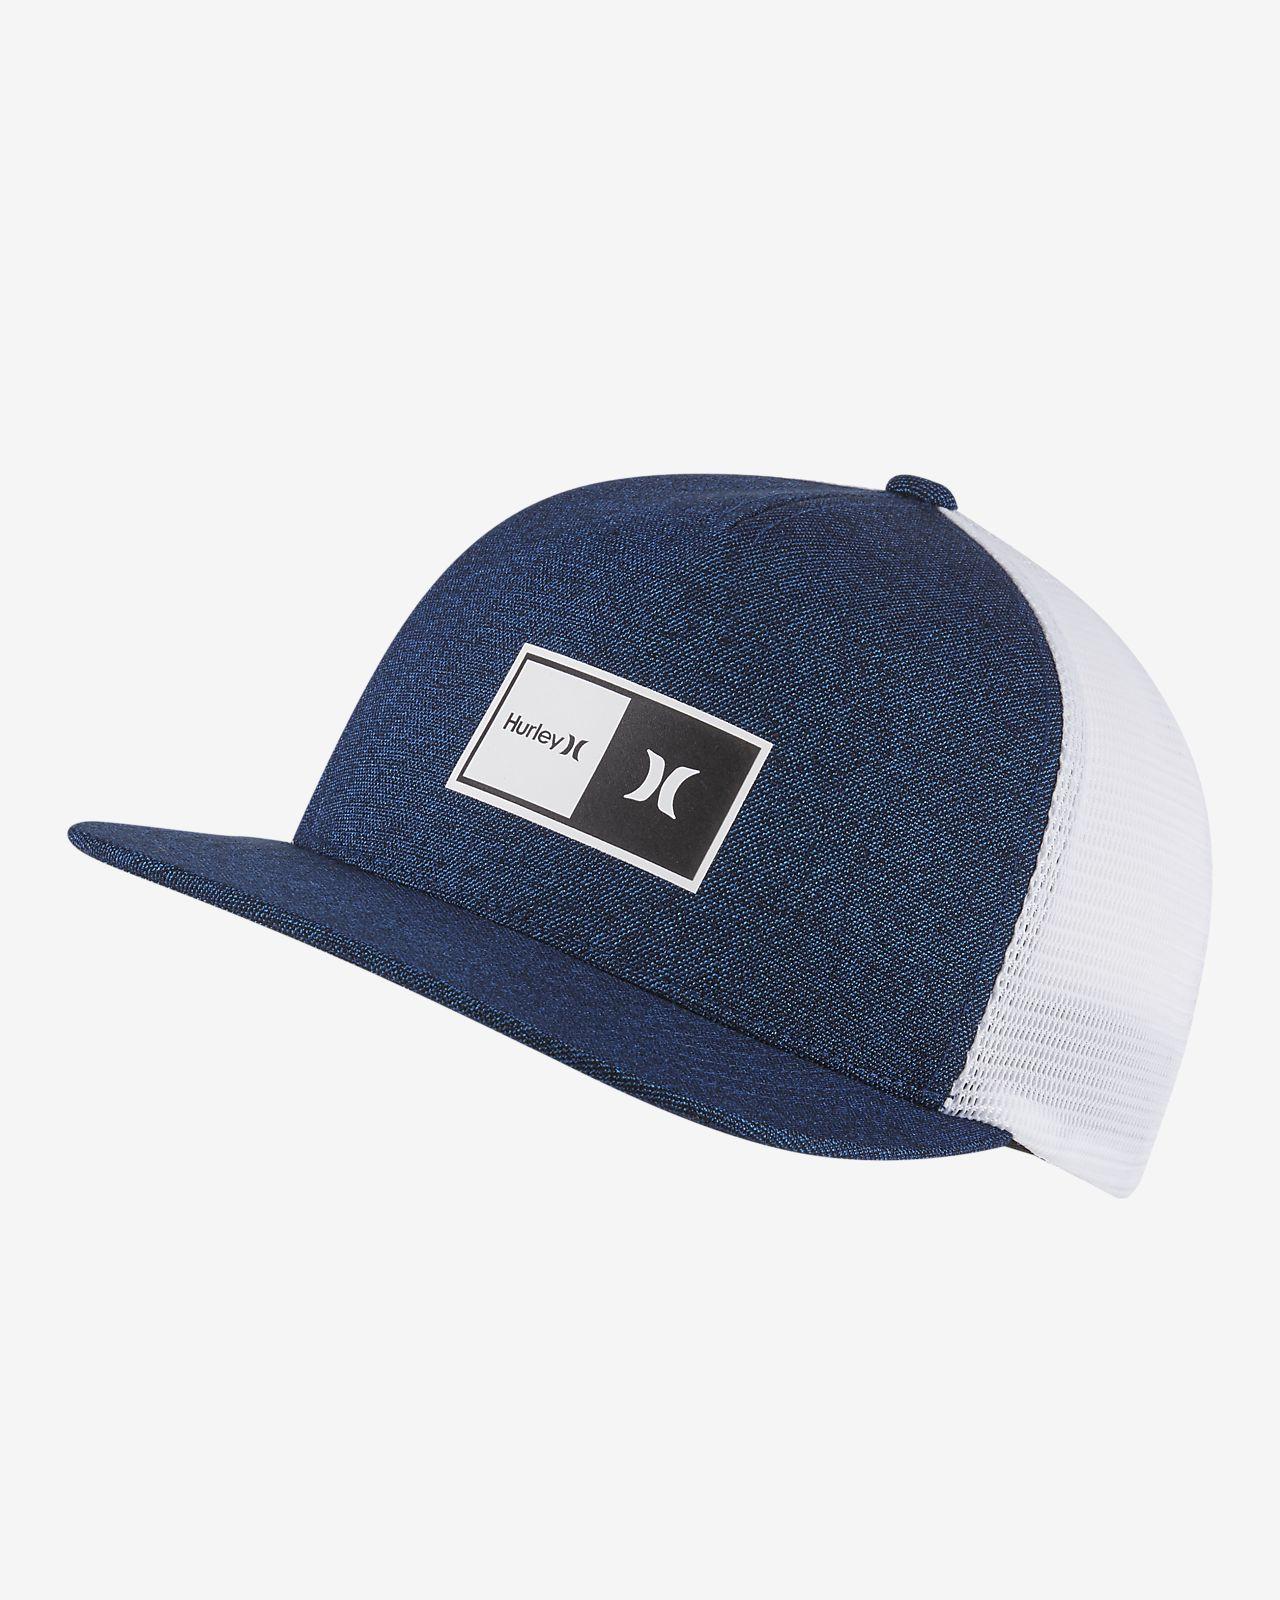 Cappello trucker Hurley Natural 2.0 - Uomo